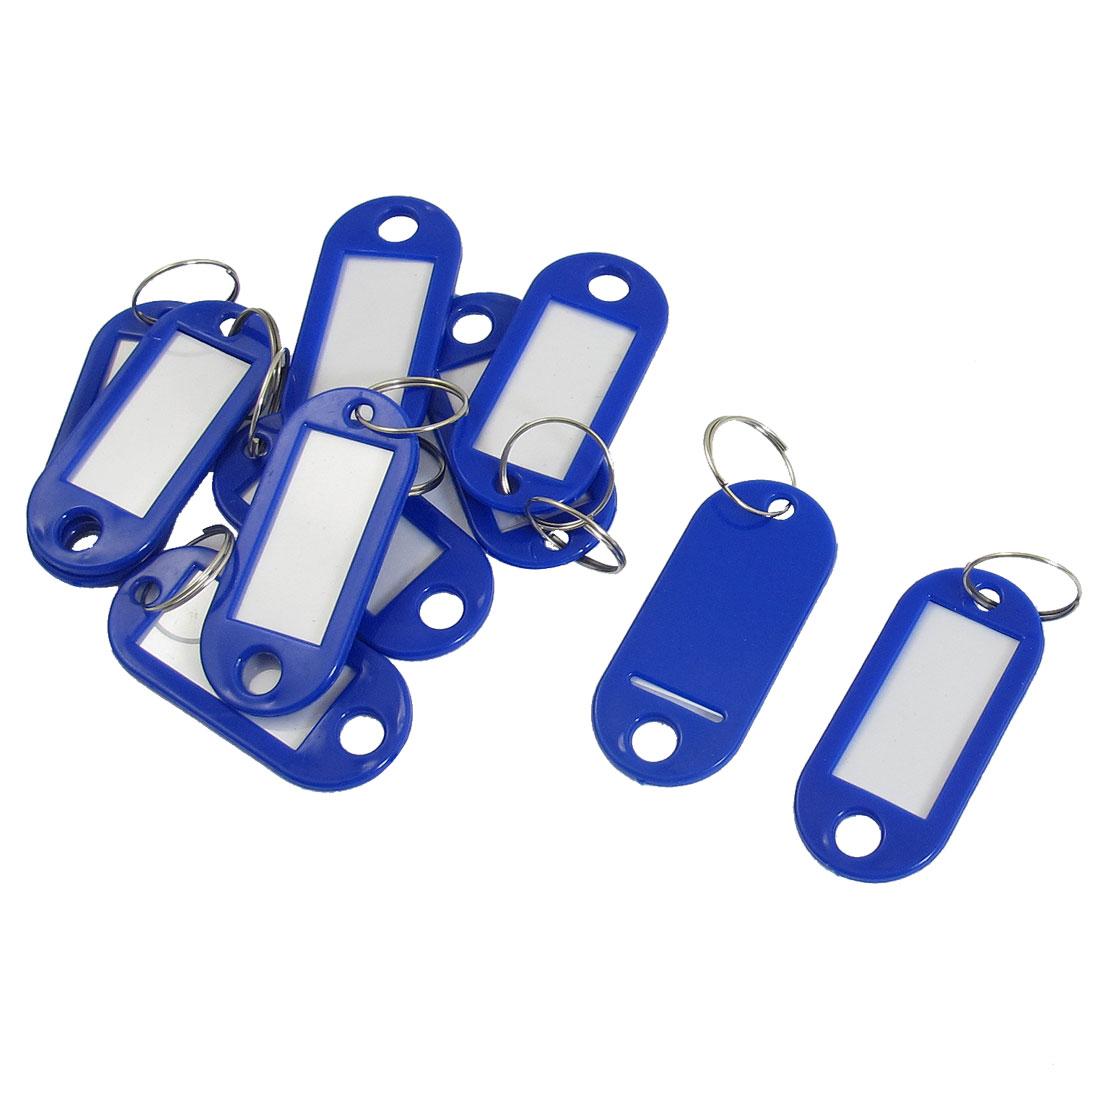 Luggage Identifiers Keychain Key ID Label Tags Split Ring Keyring Blue 10 Pcs